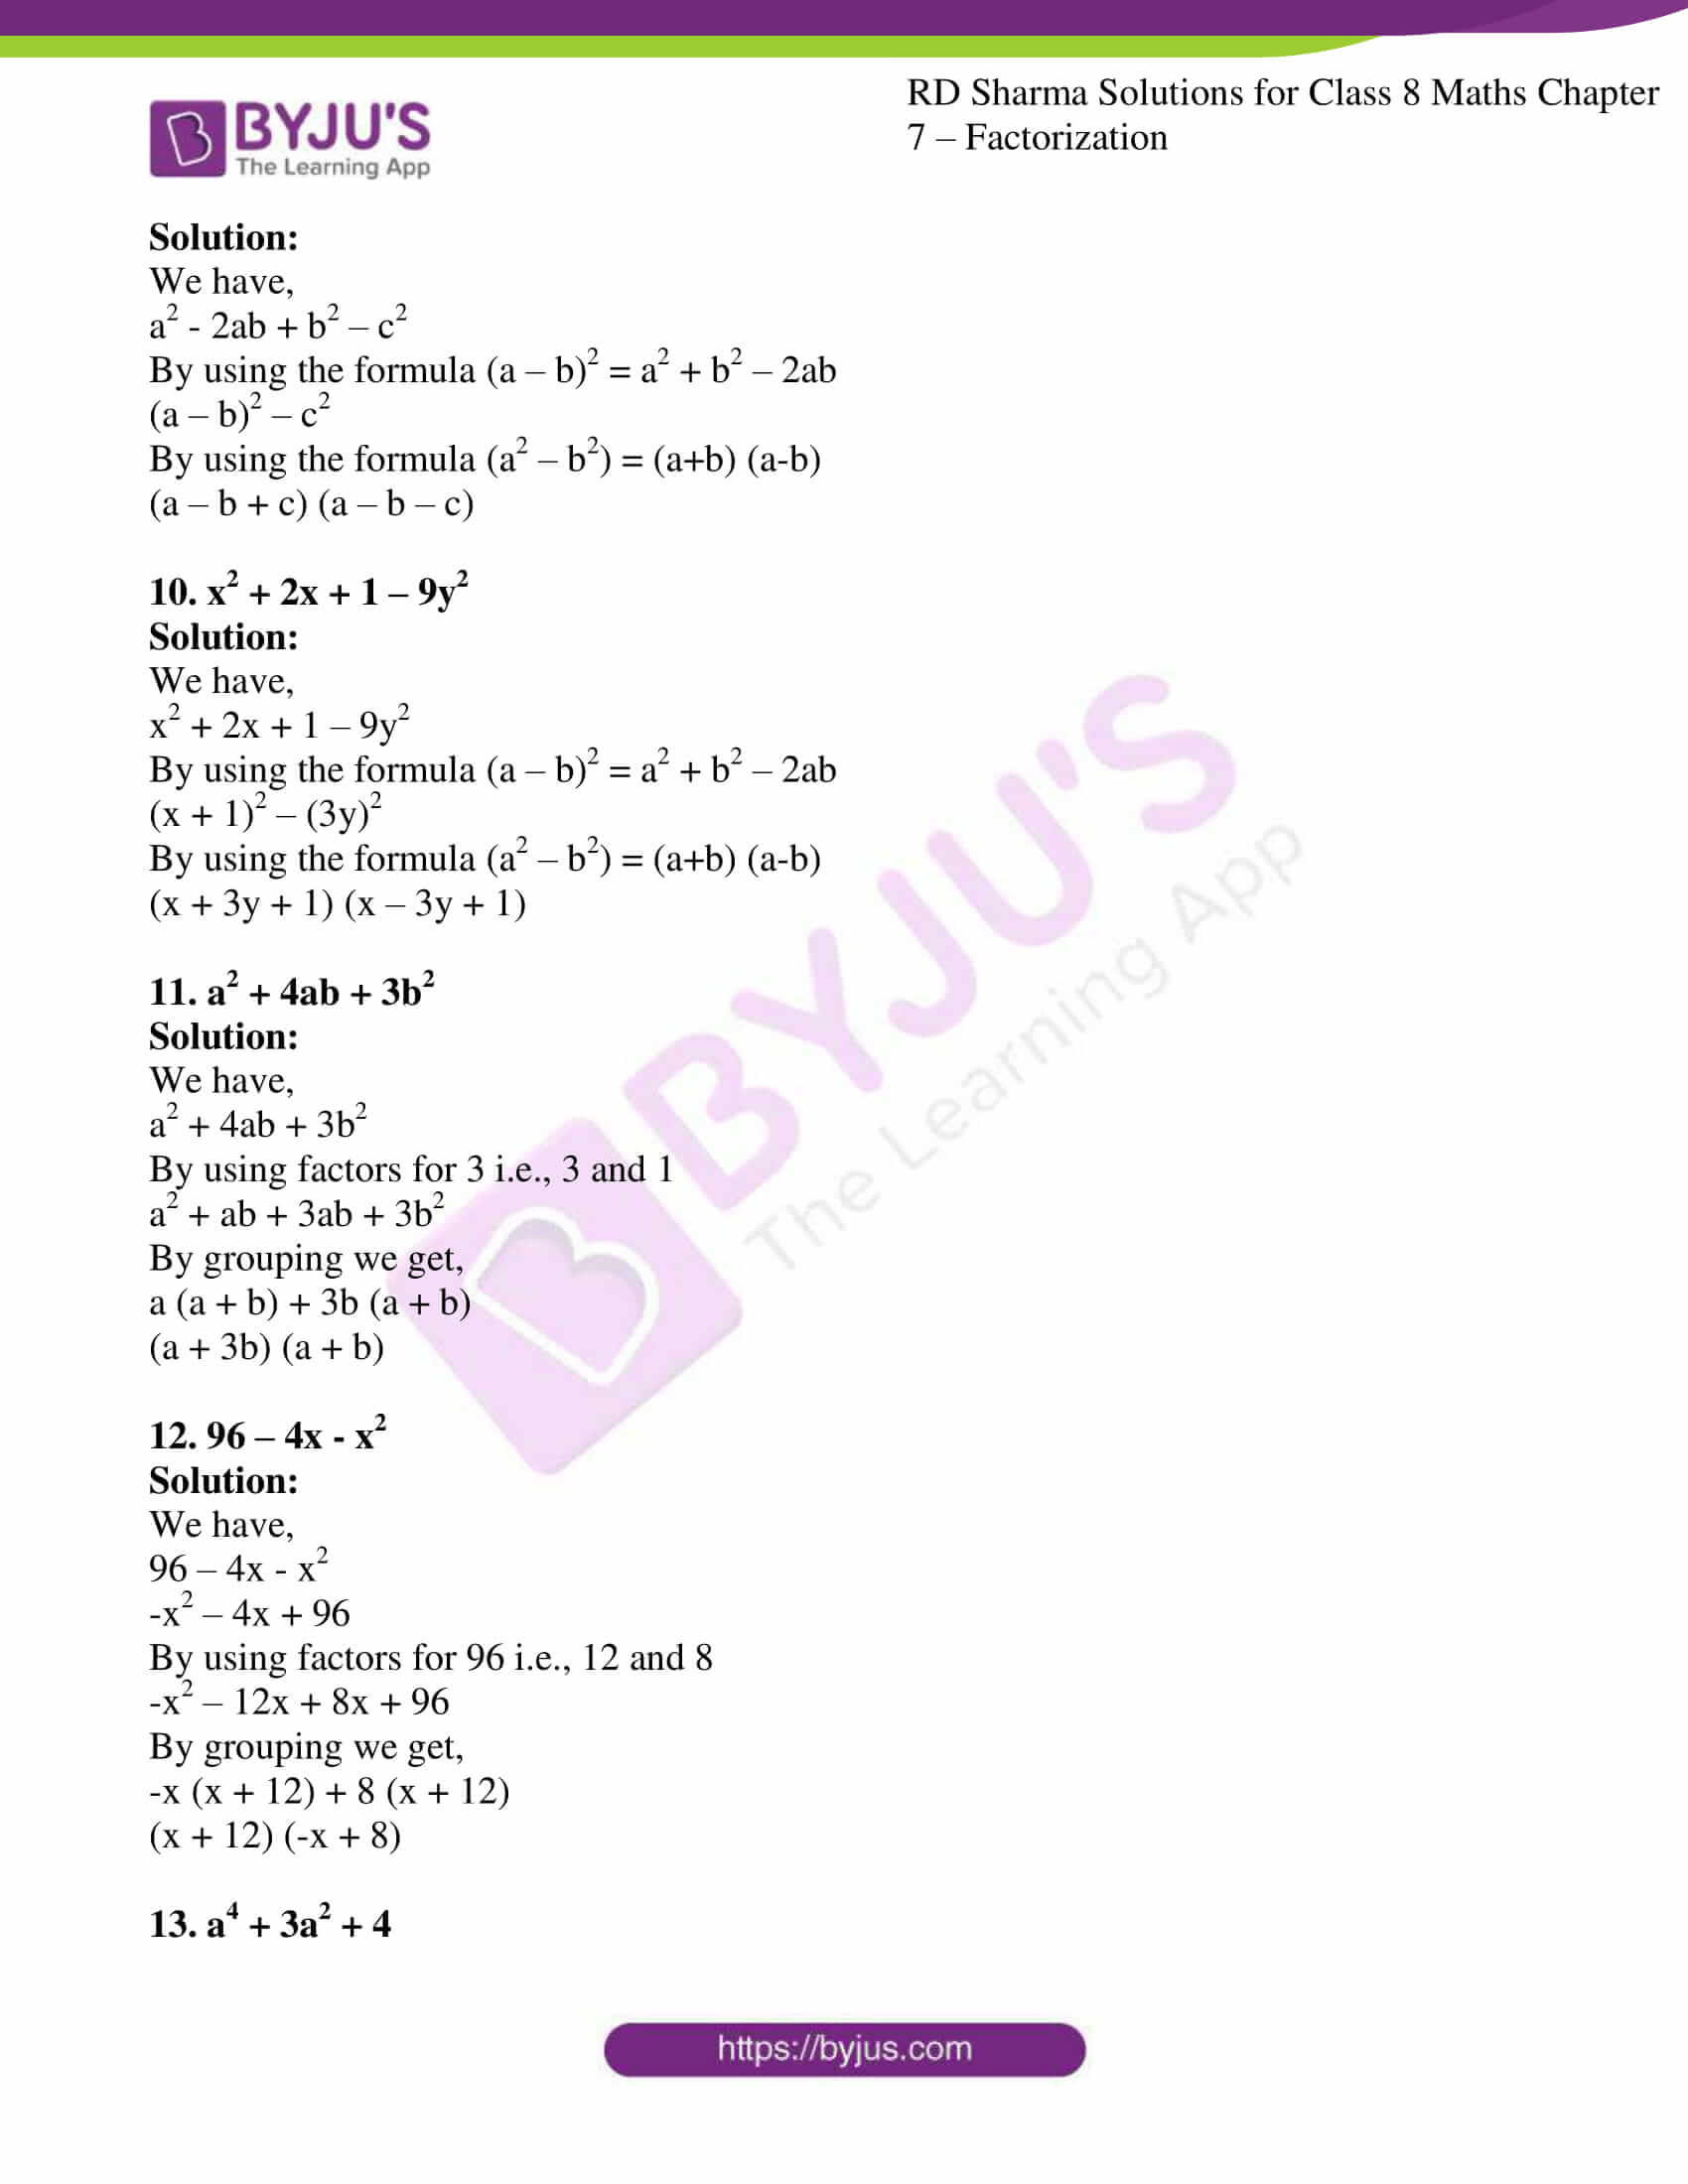 rd sharma class 8 maths chapter 7 exercise 6 3